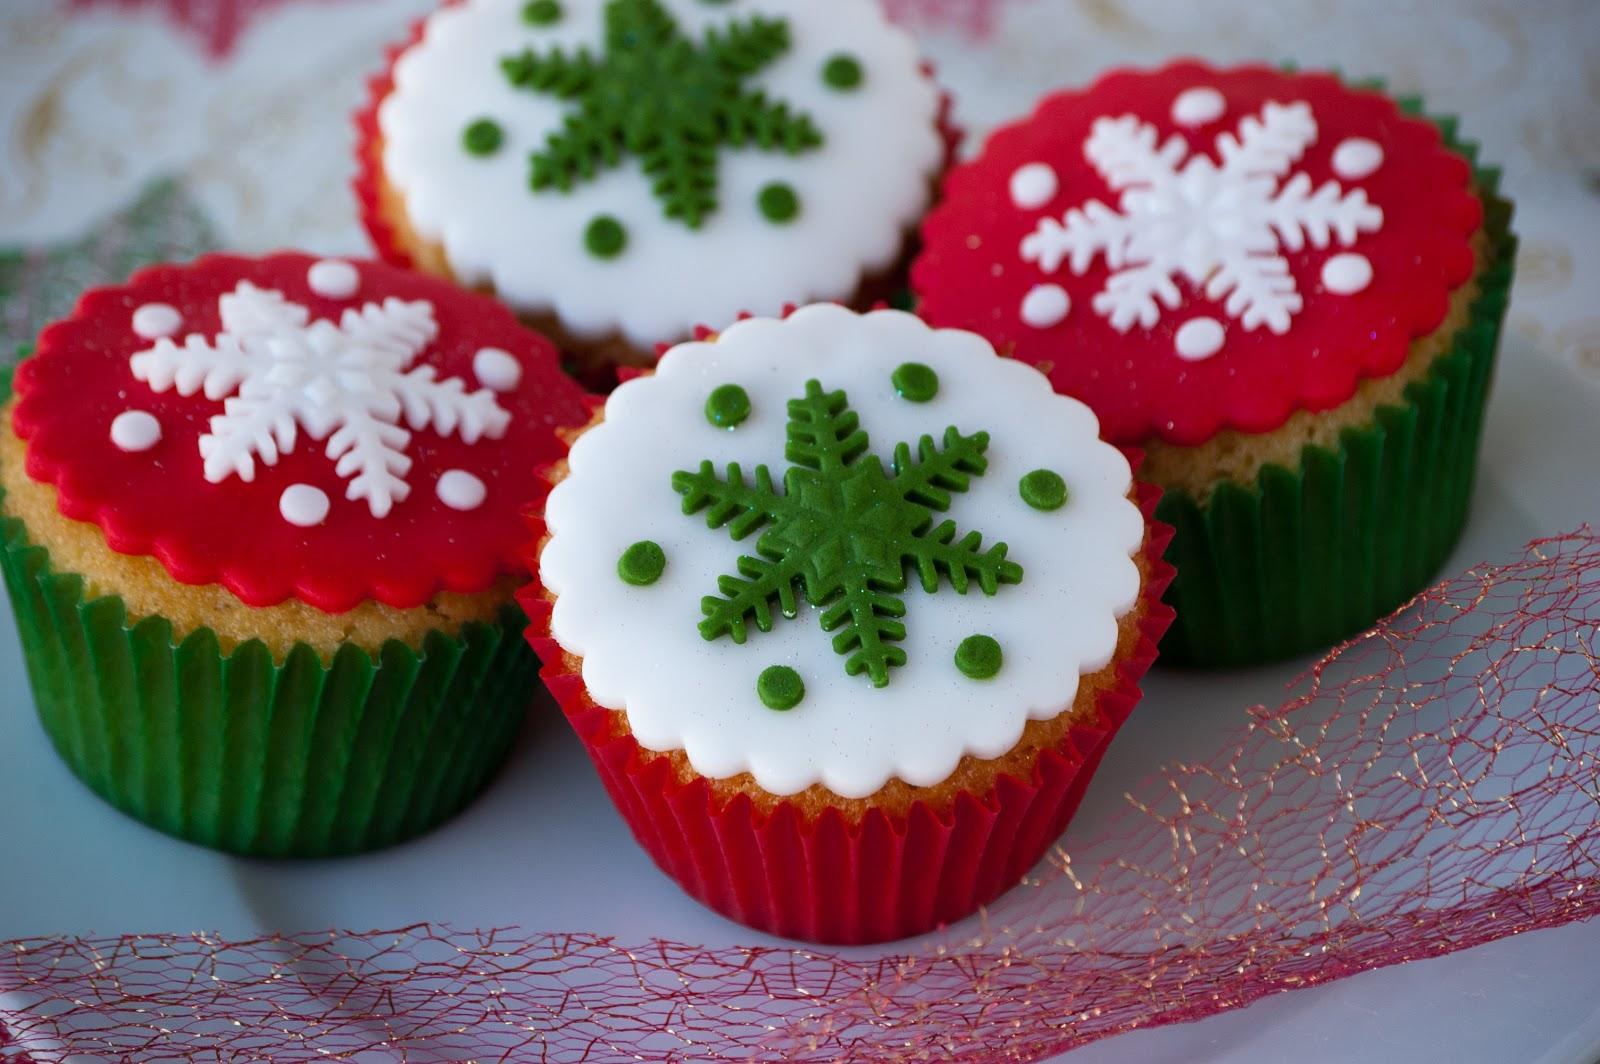 Formas cupcake/doces finos